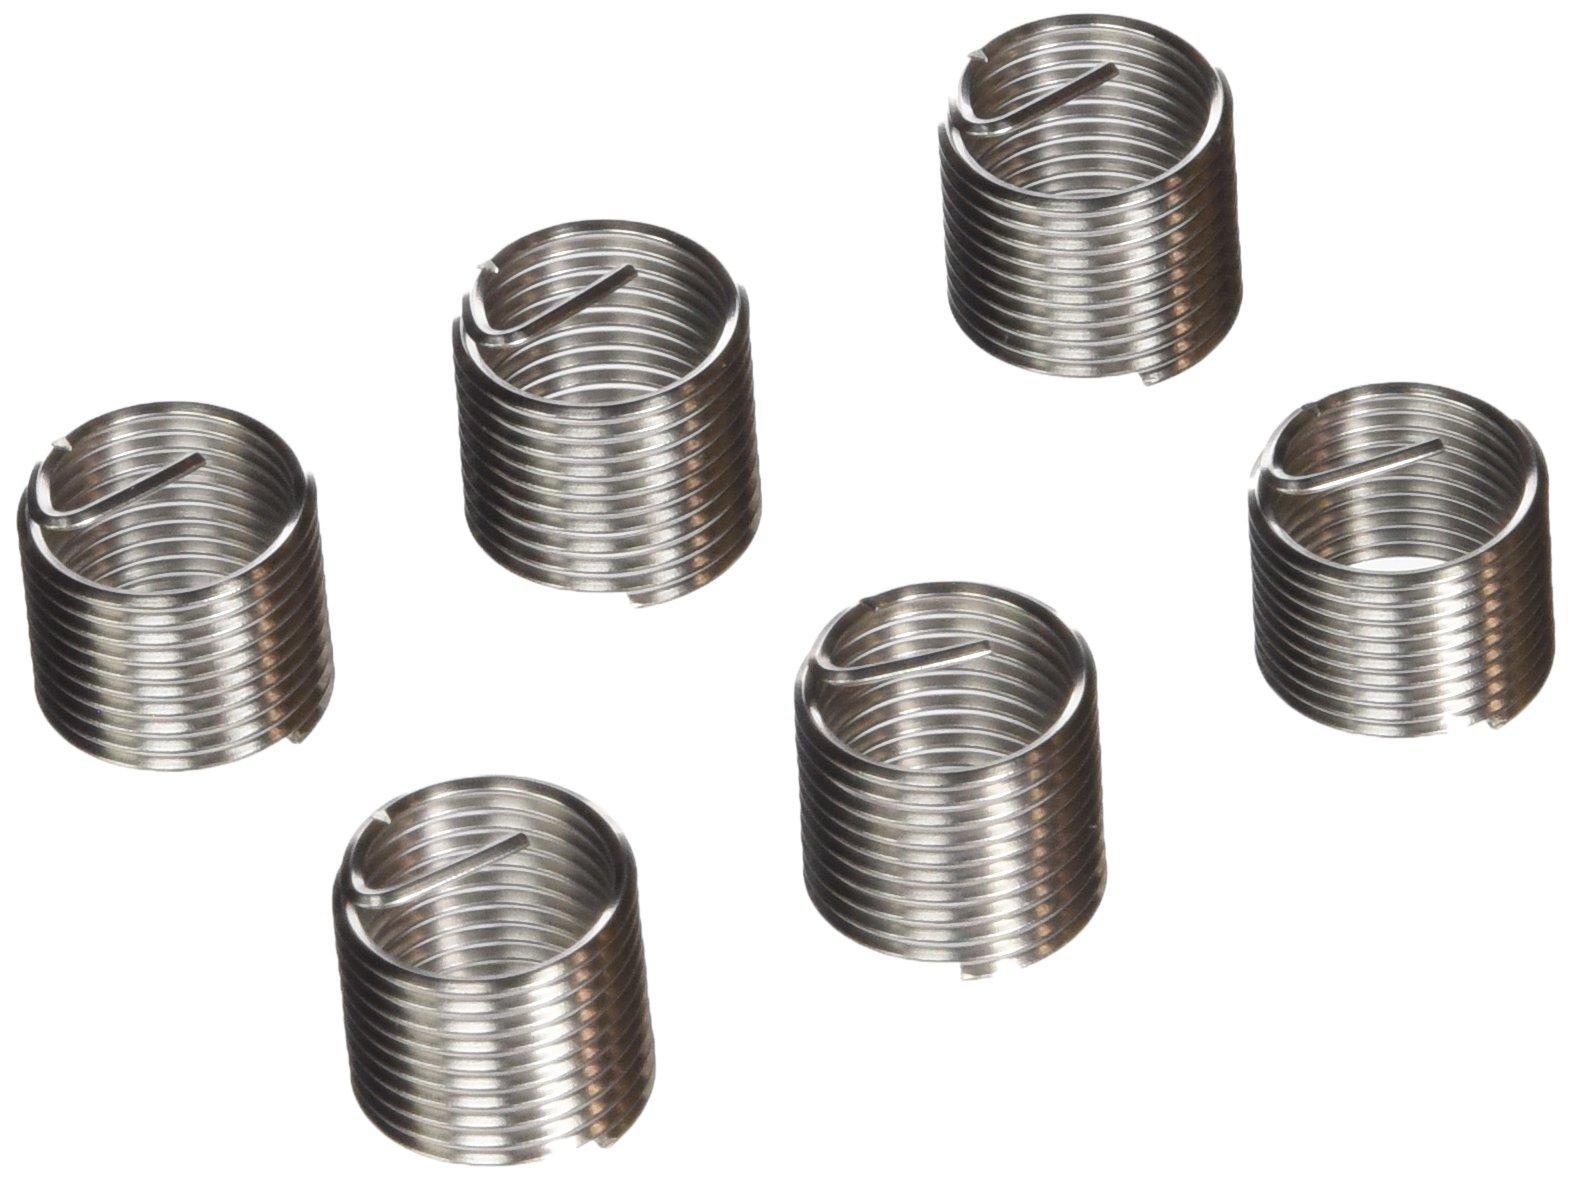 Heli-Coil R51310 M14-1.25 Inserts/Pk 6